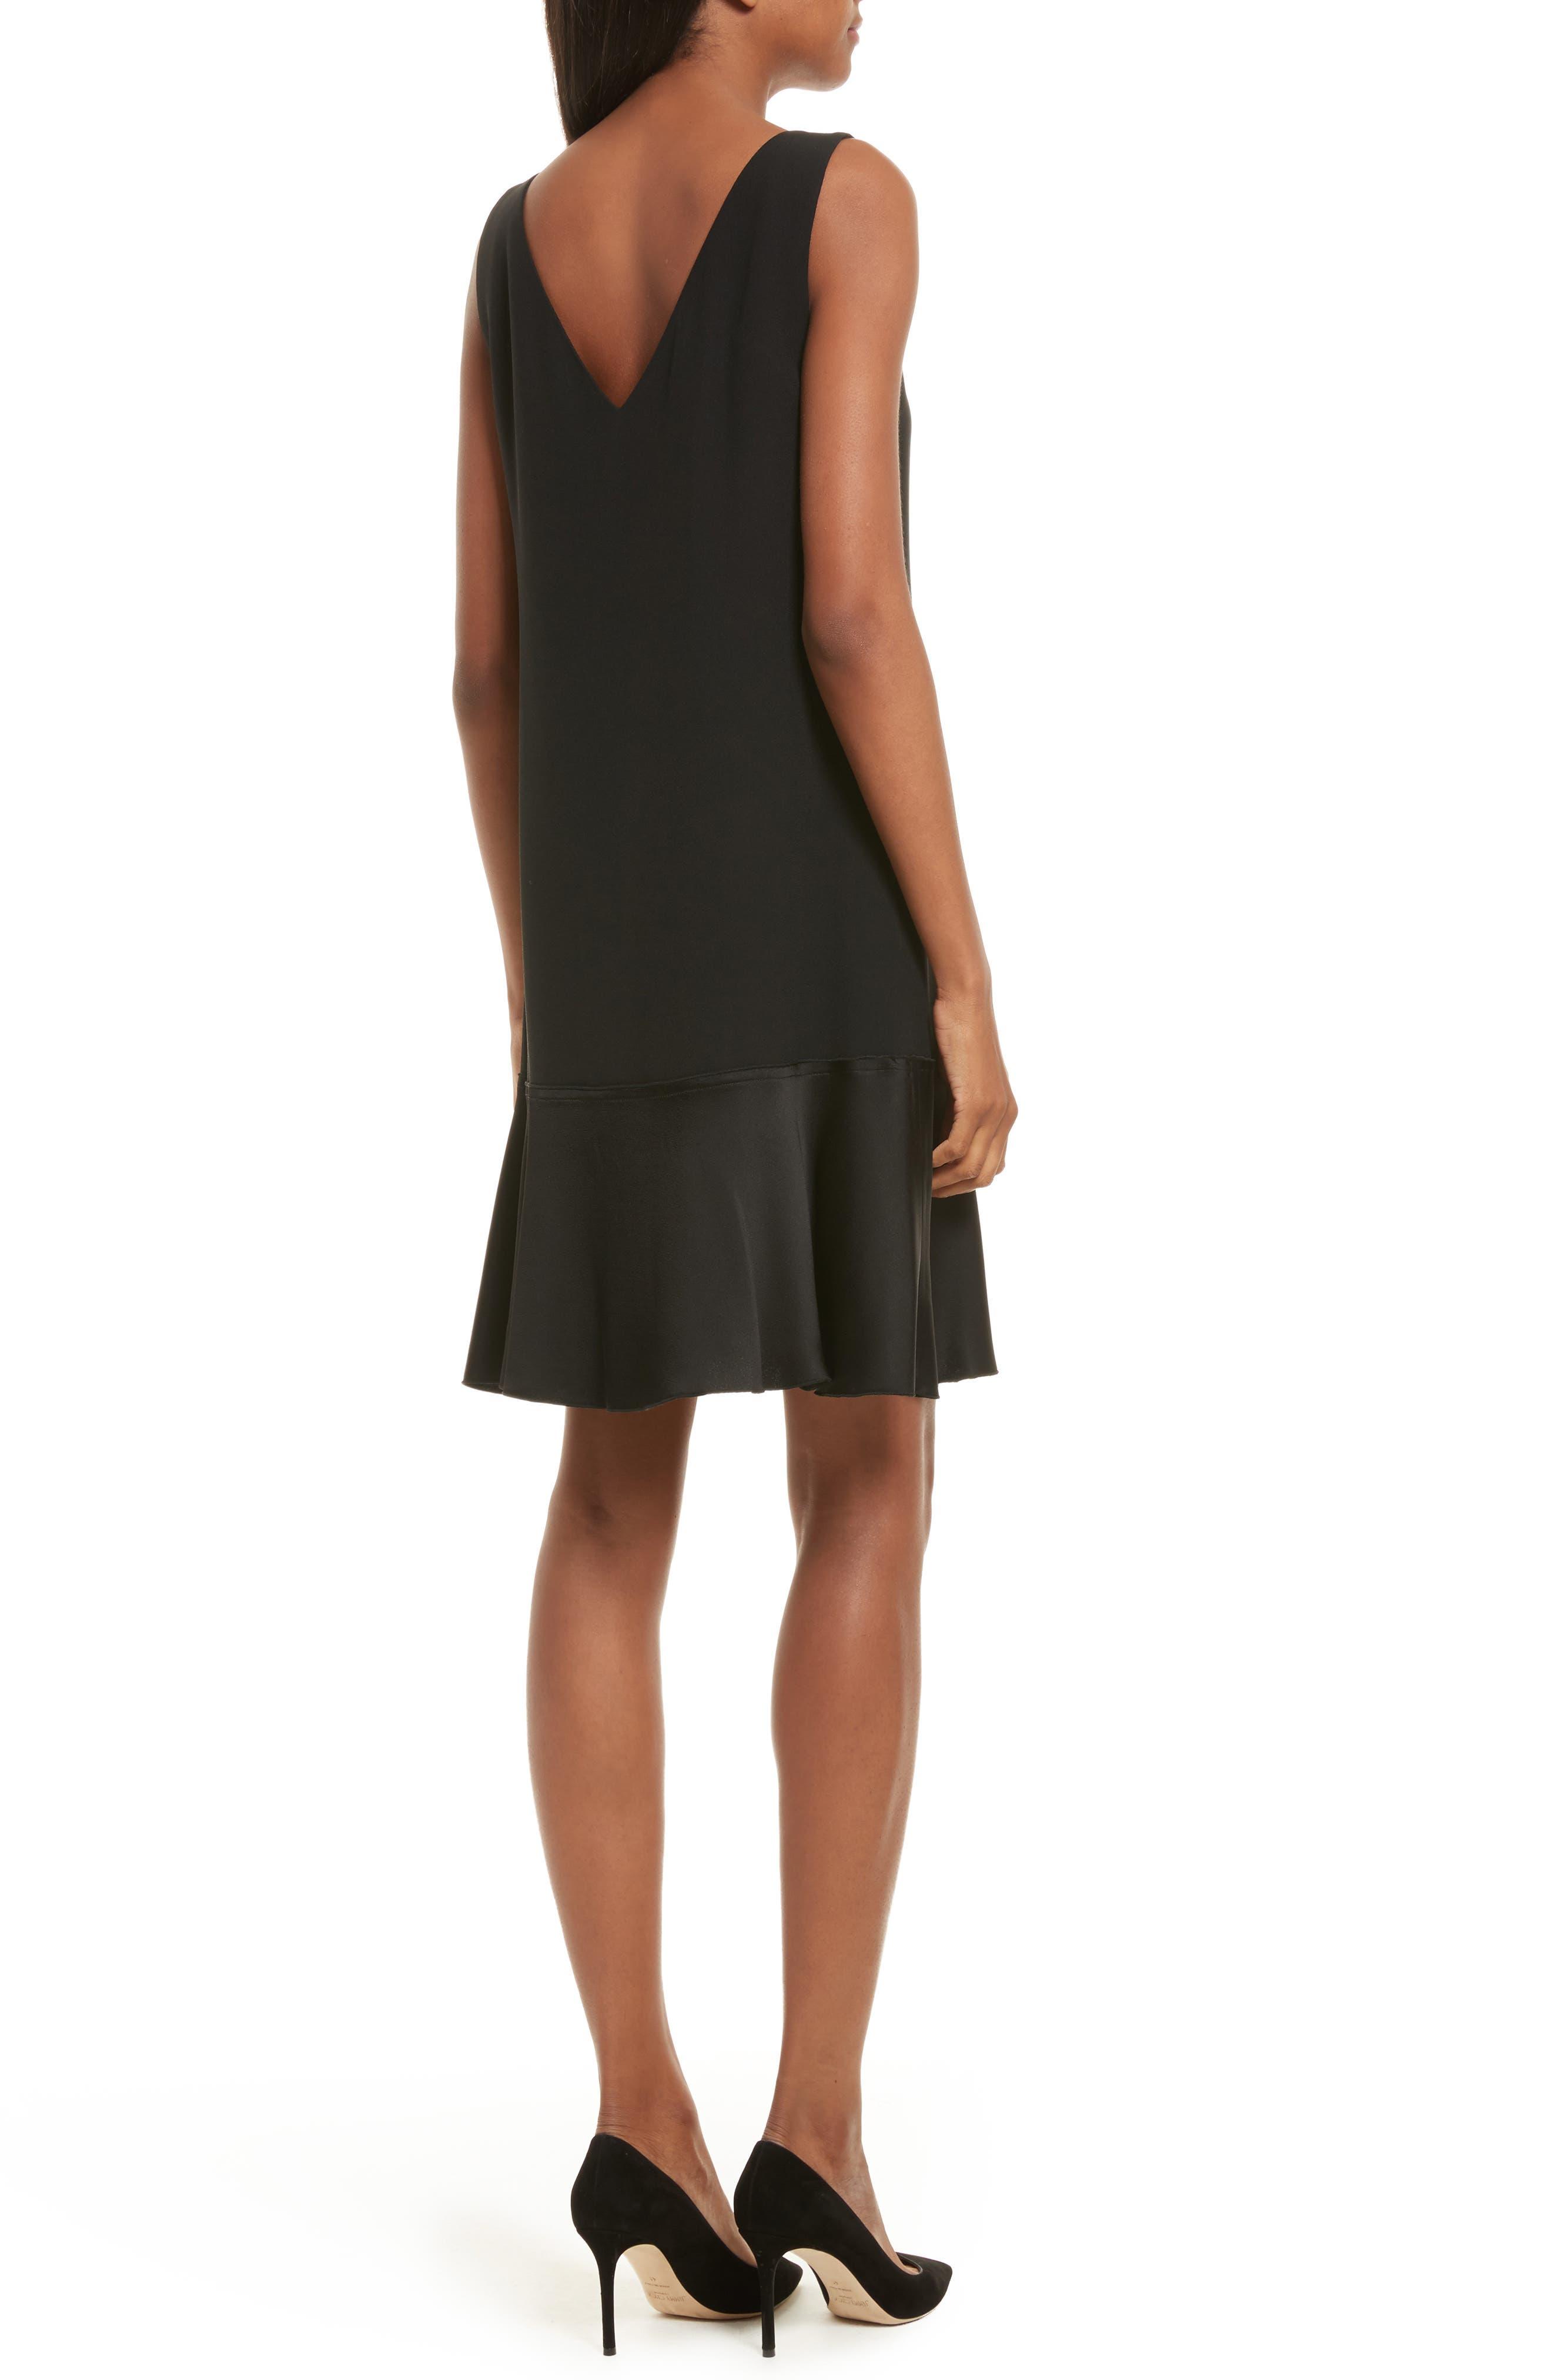 Kensington Flirty Flare Dress,                             Alternate thumbnail 2, color,                             Black